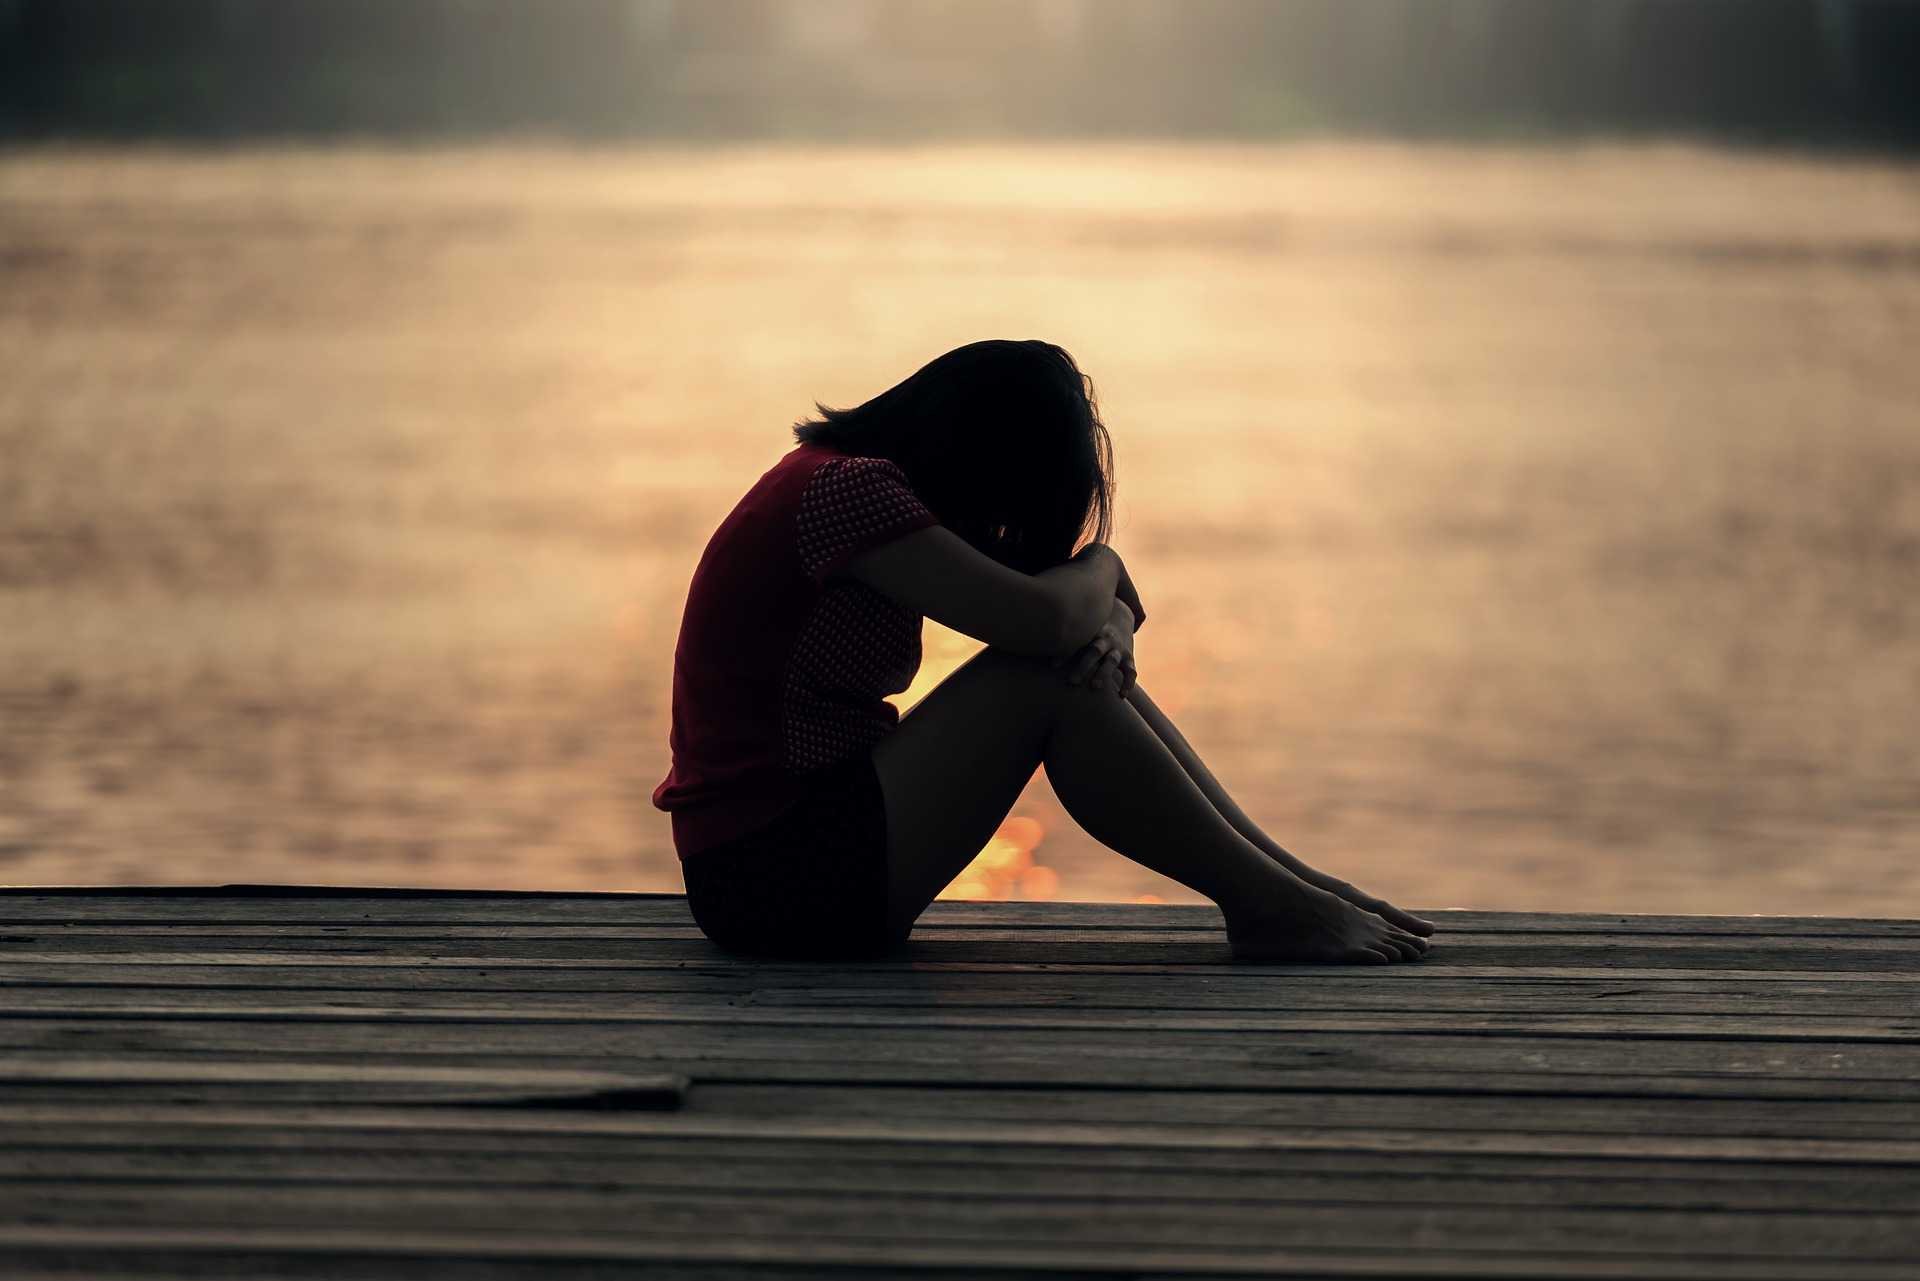 CEDU – Italia condannata per violazione dei diritti di una vittima di stupro (causa J.L. c. ITALIE).